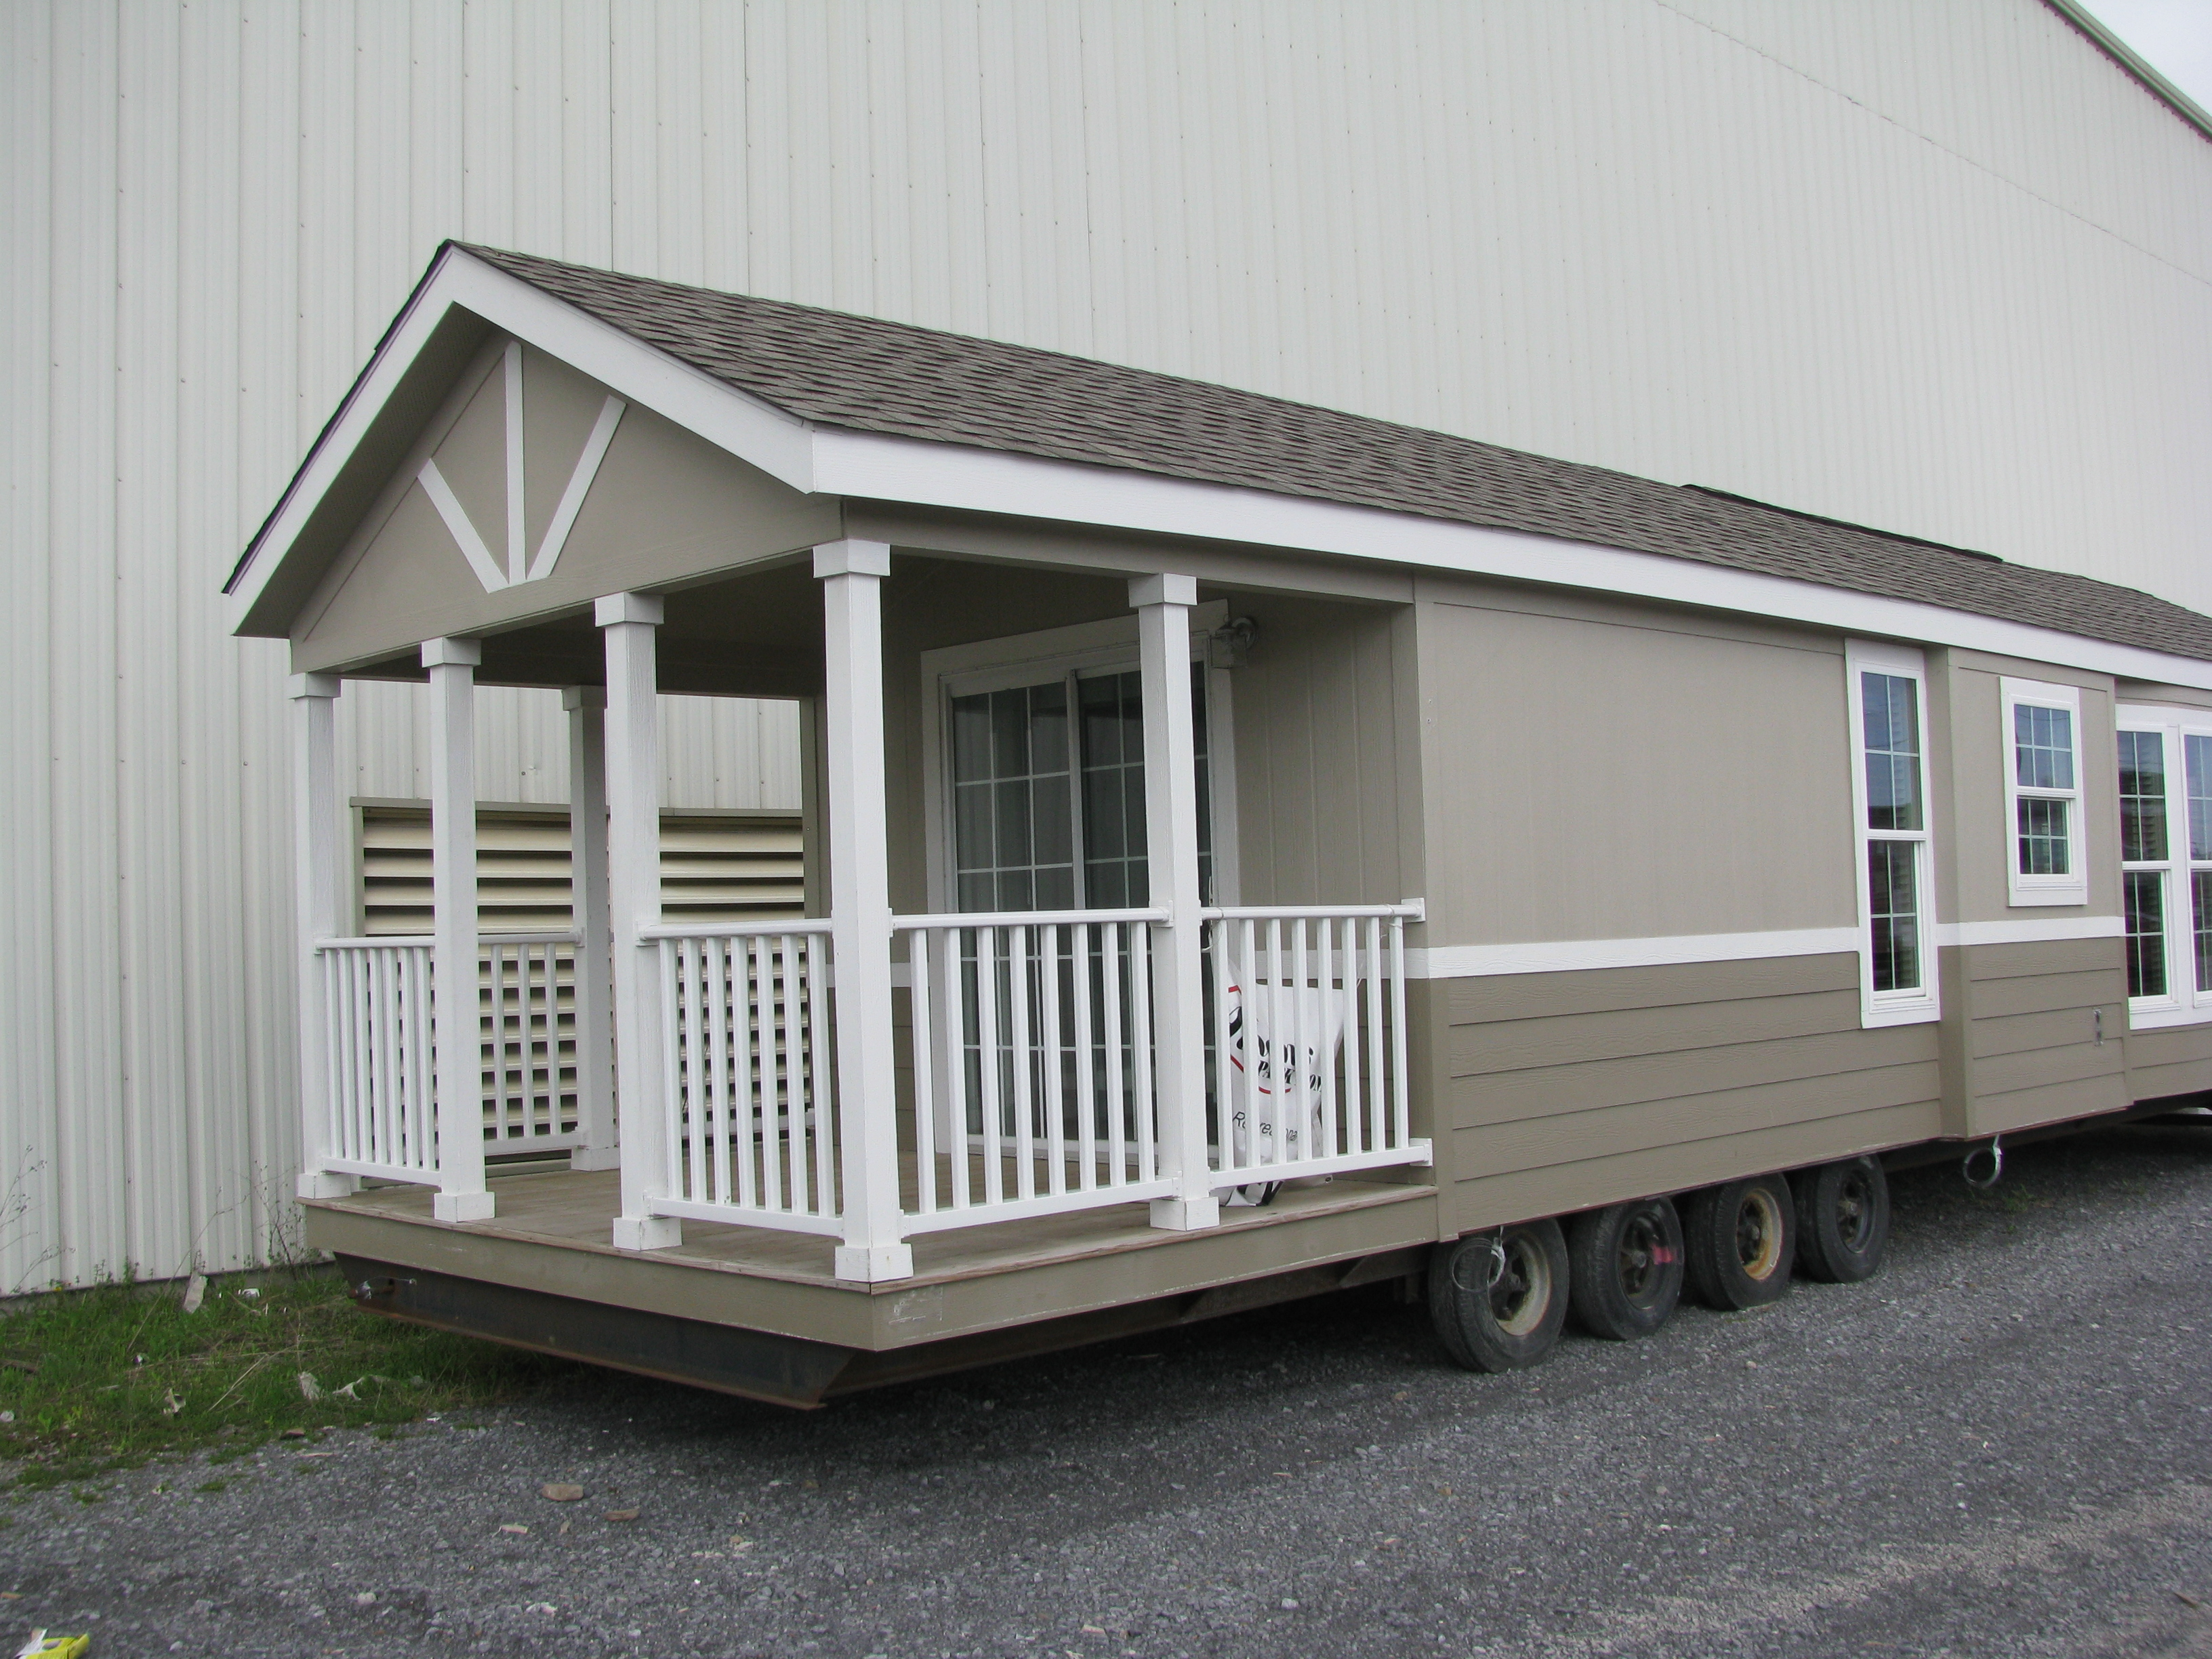 Park Model Campers | Woodframe Structures